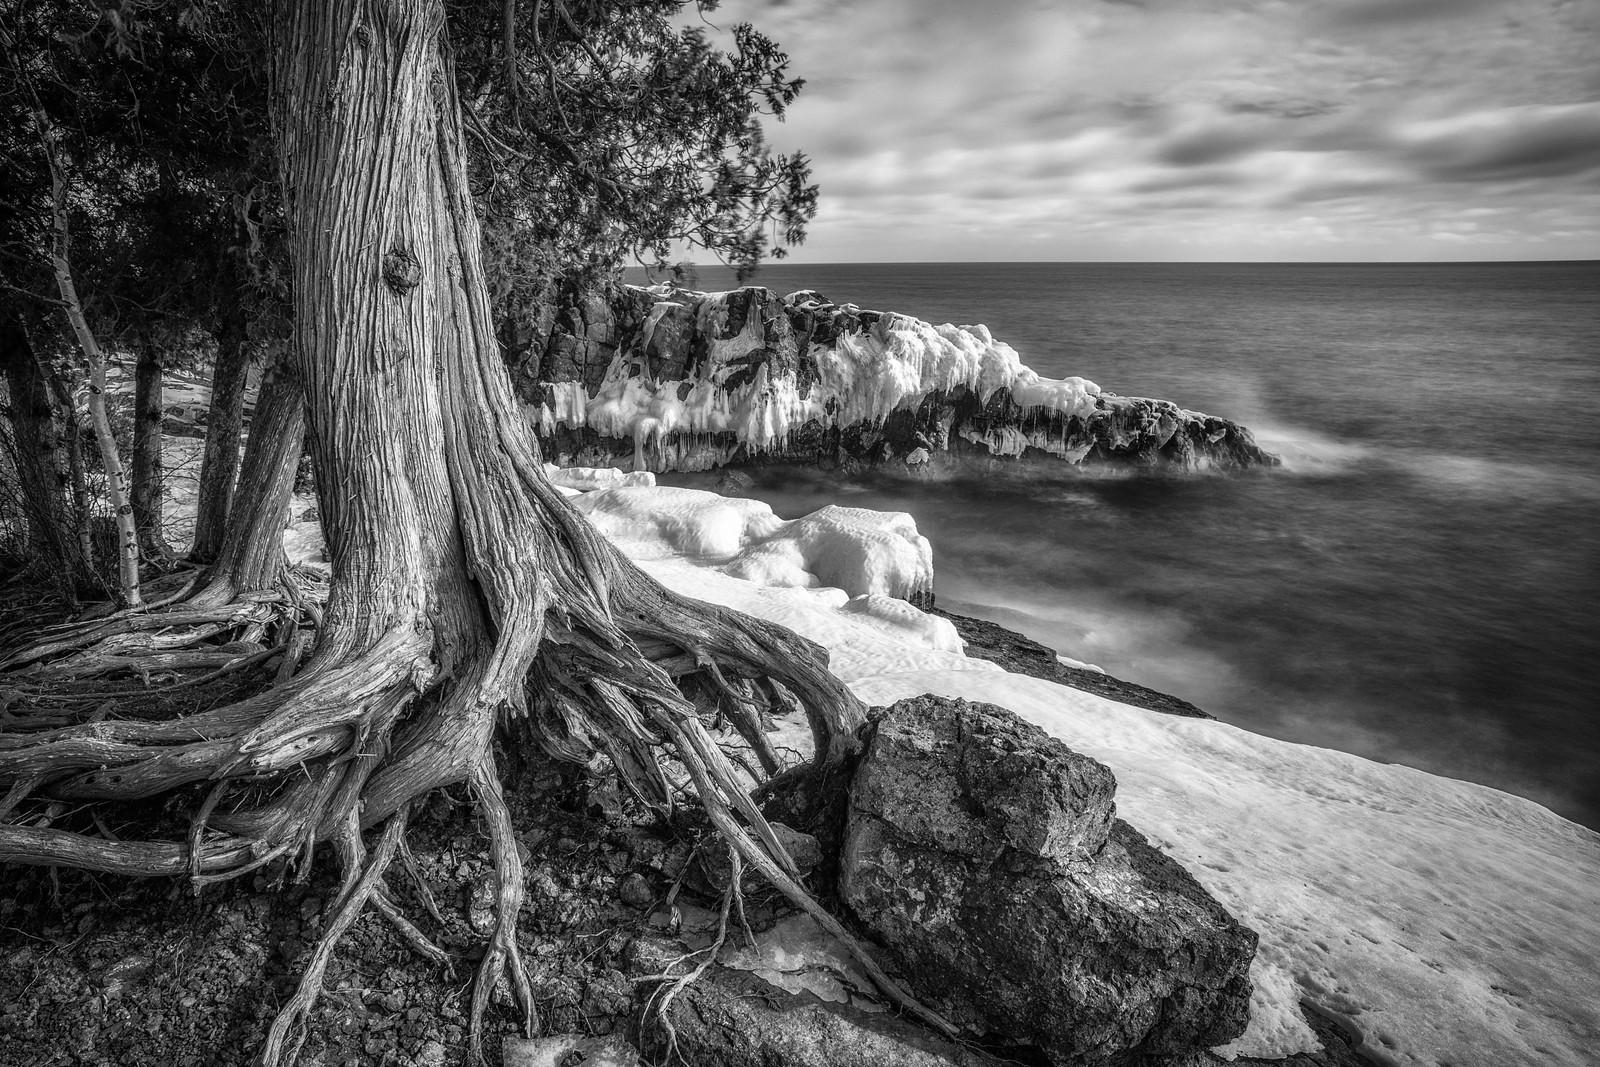 Sugar Loaf Cove